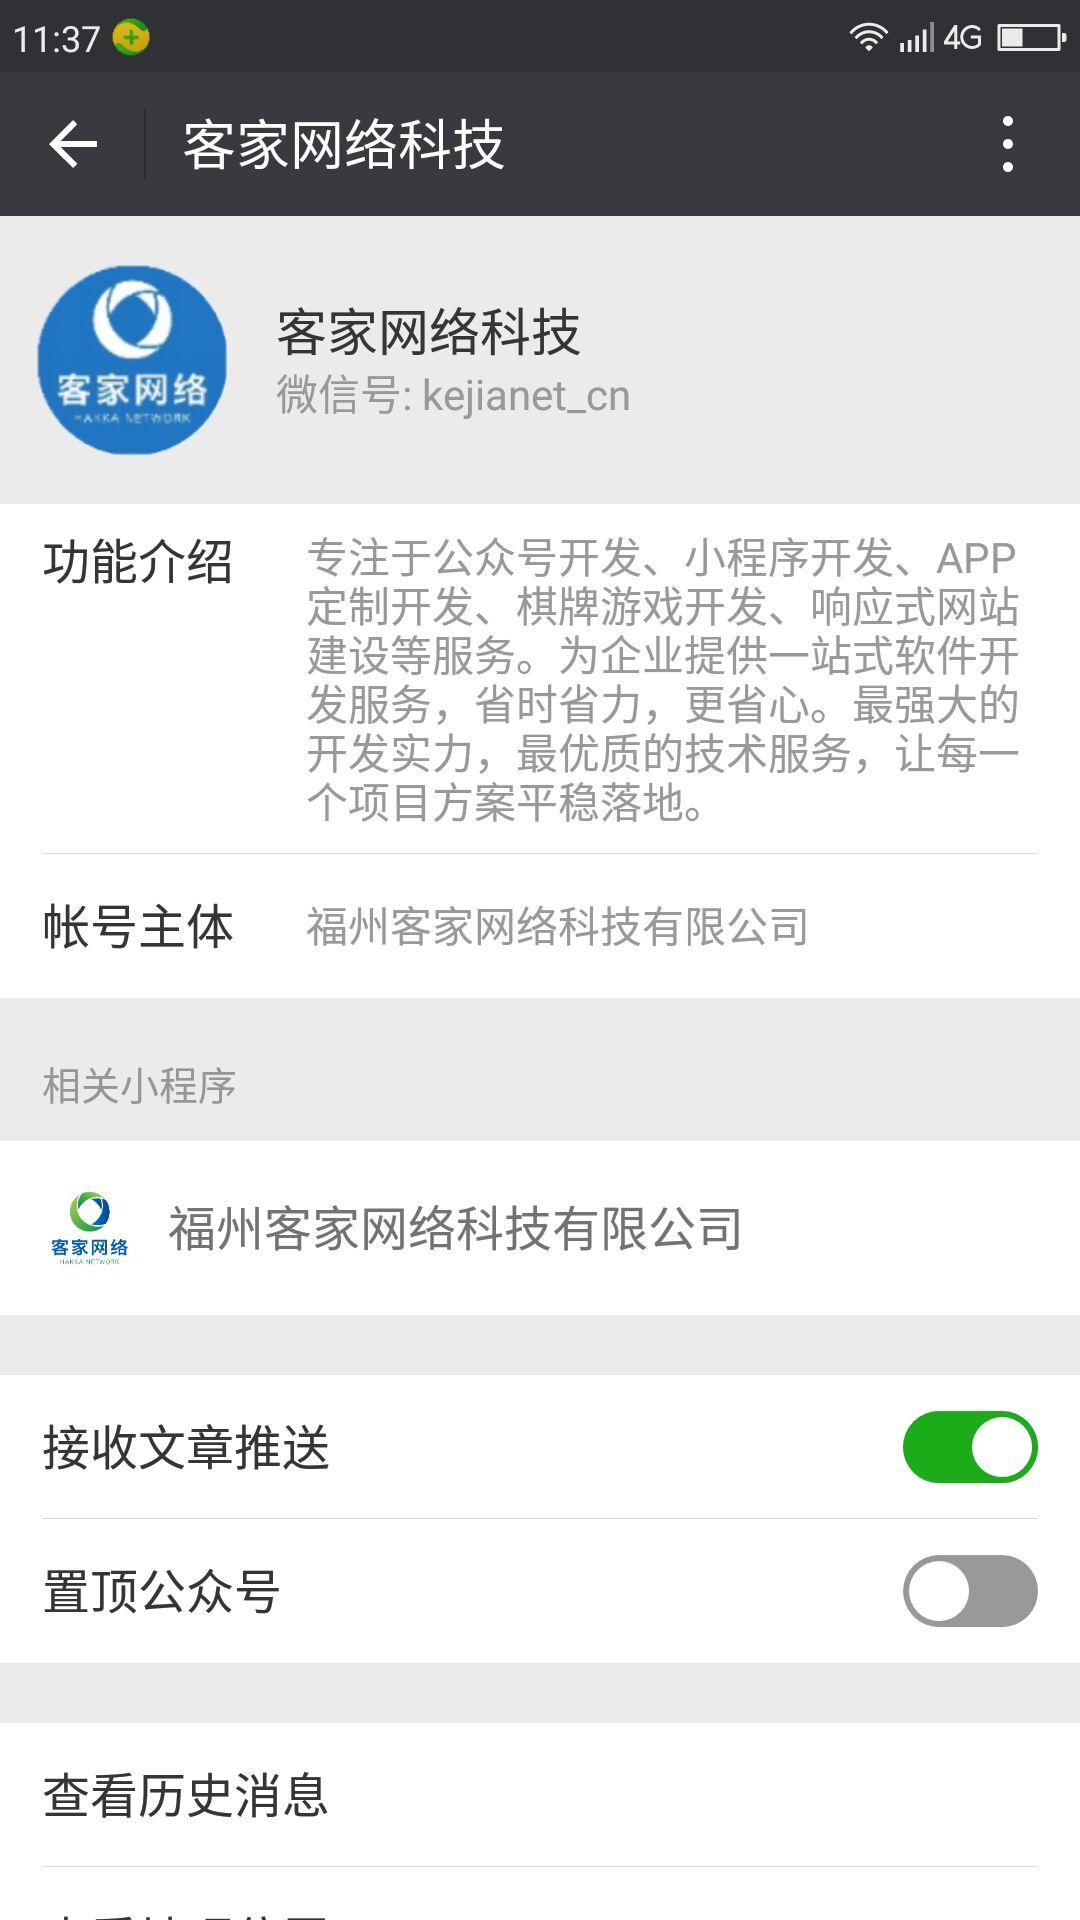 QQ图片20170821113901 客家网络给大家盘点微信小程序常见问题